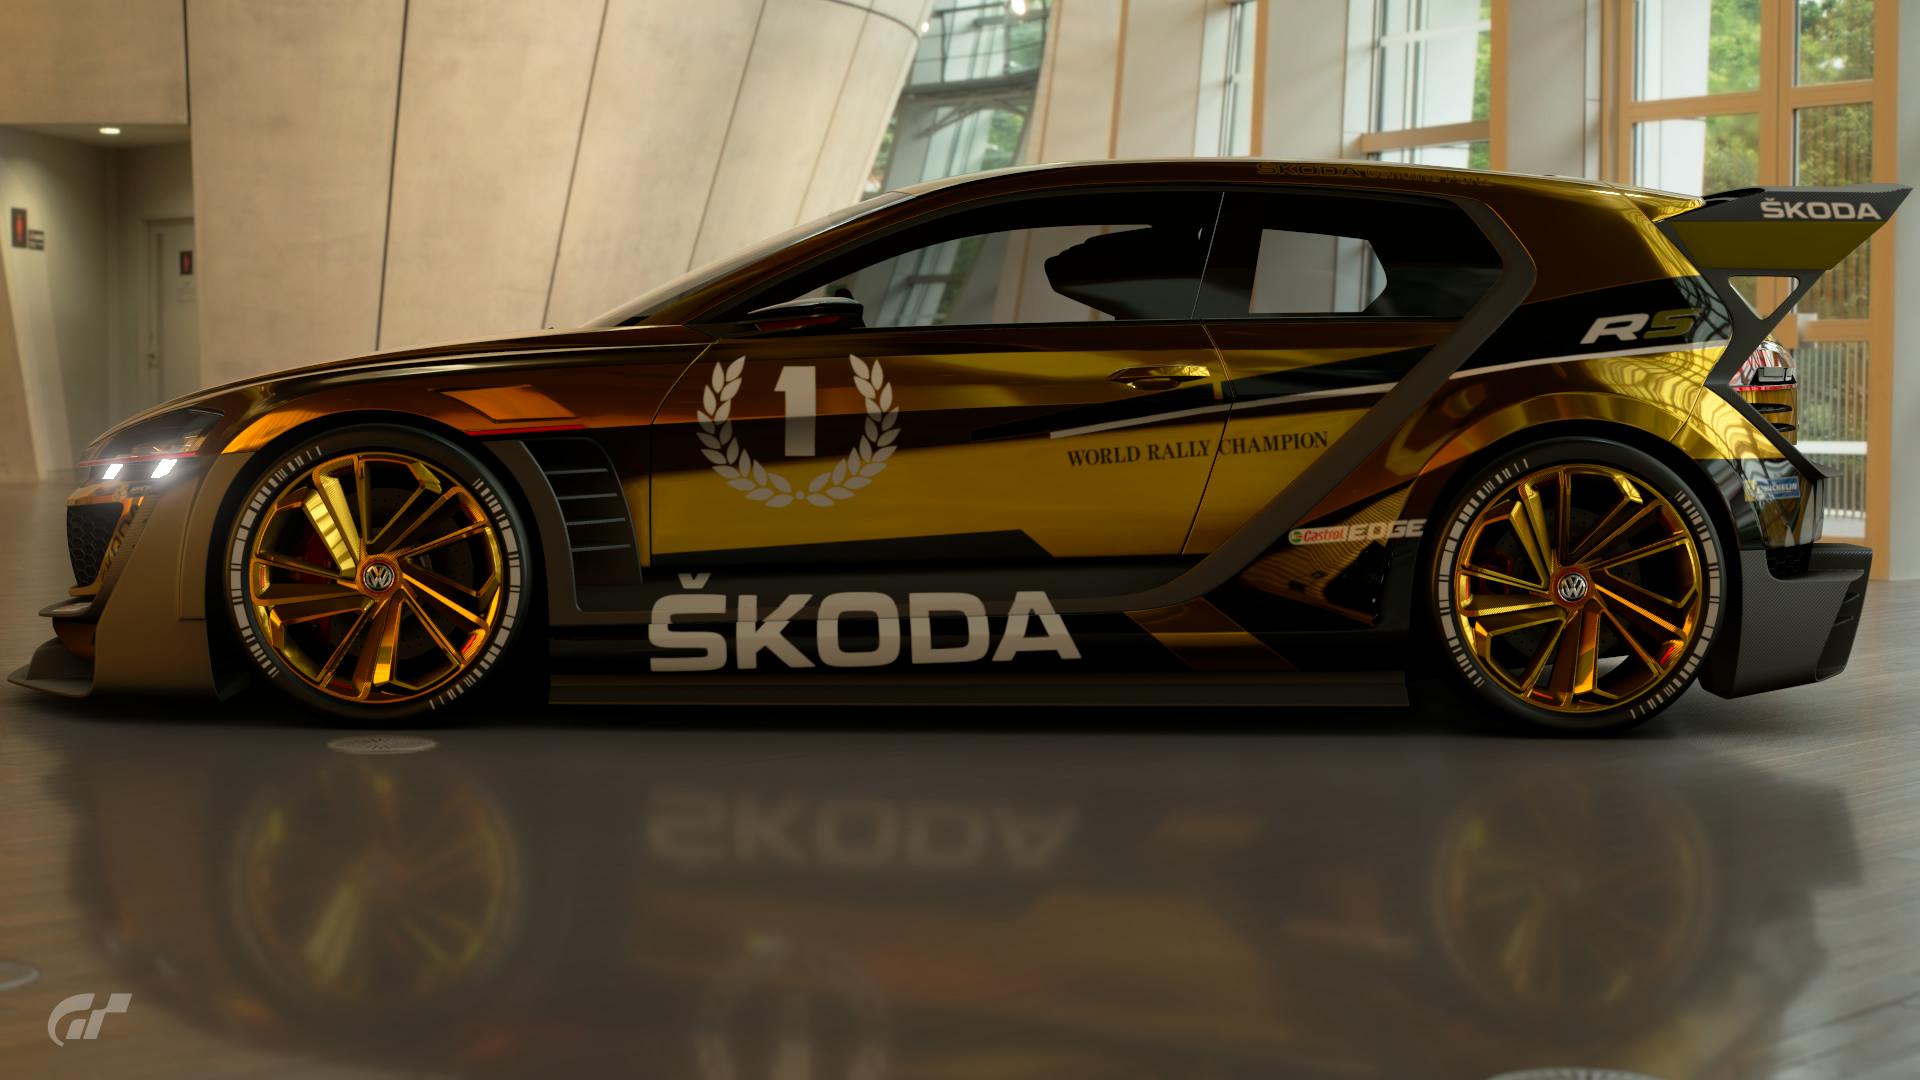 Skoda Fabia R5 Wrc2 World Champ Scapes Photos By Svanacore Community Gran Turismo Sport